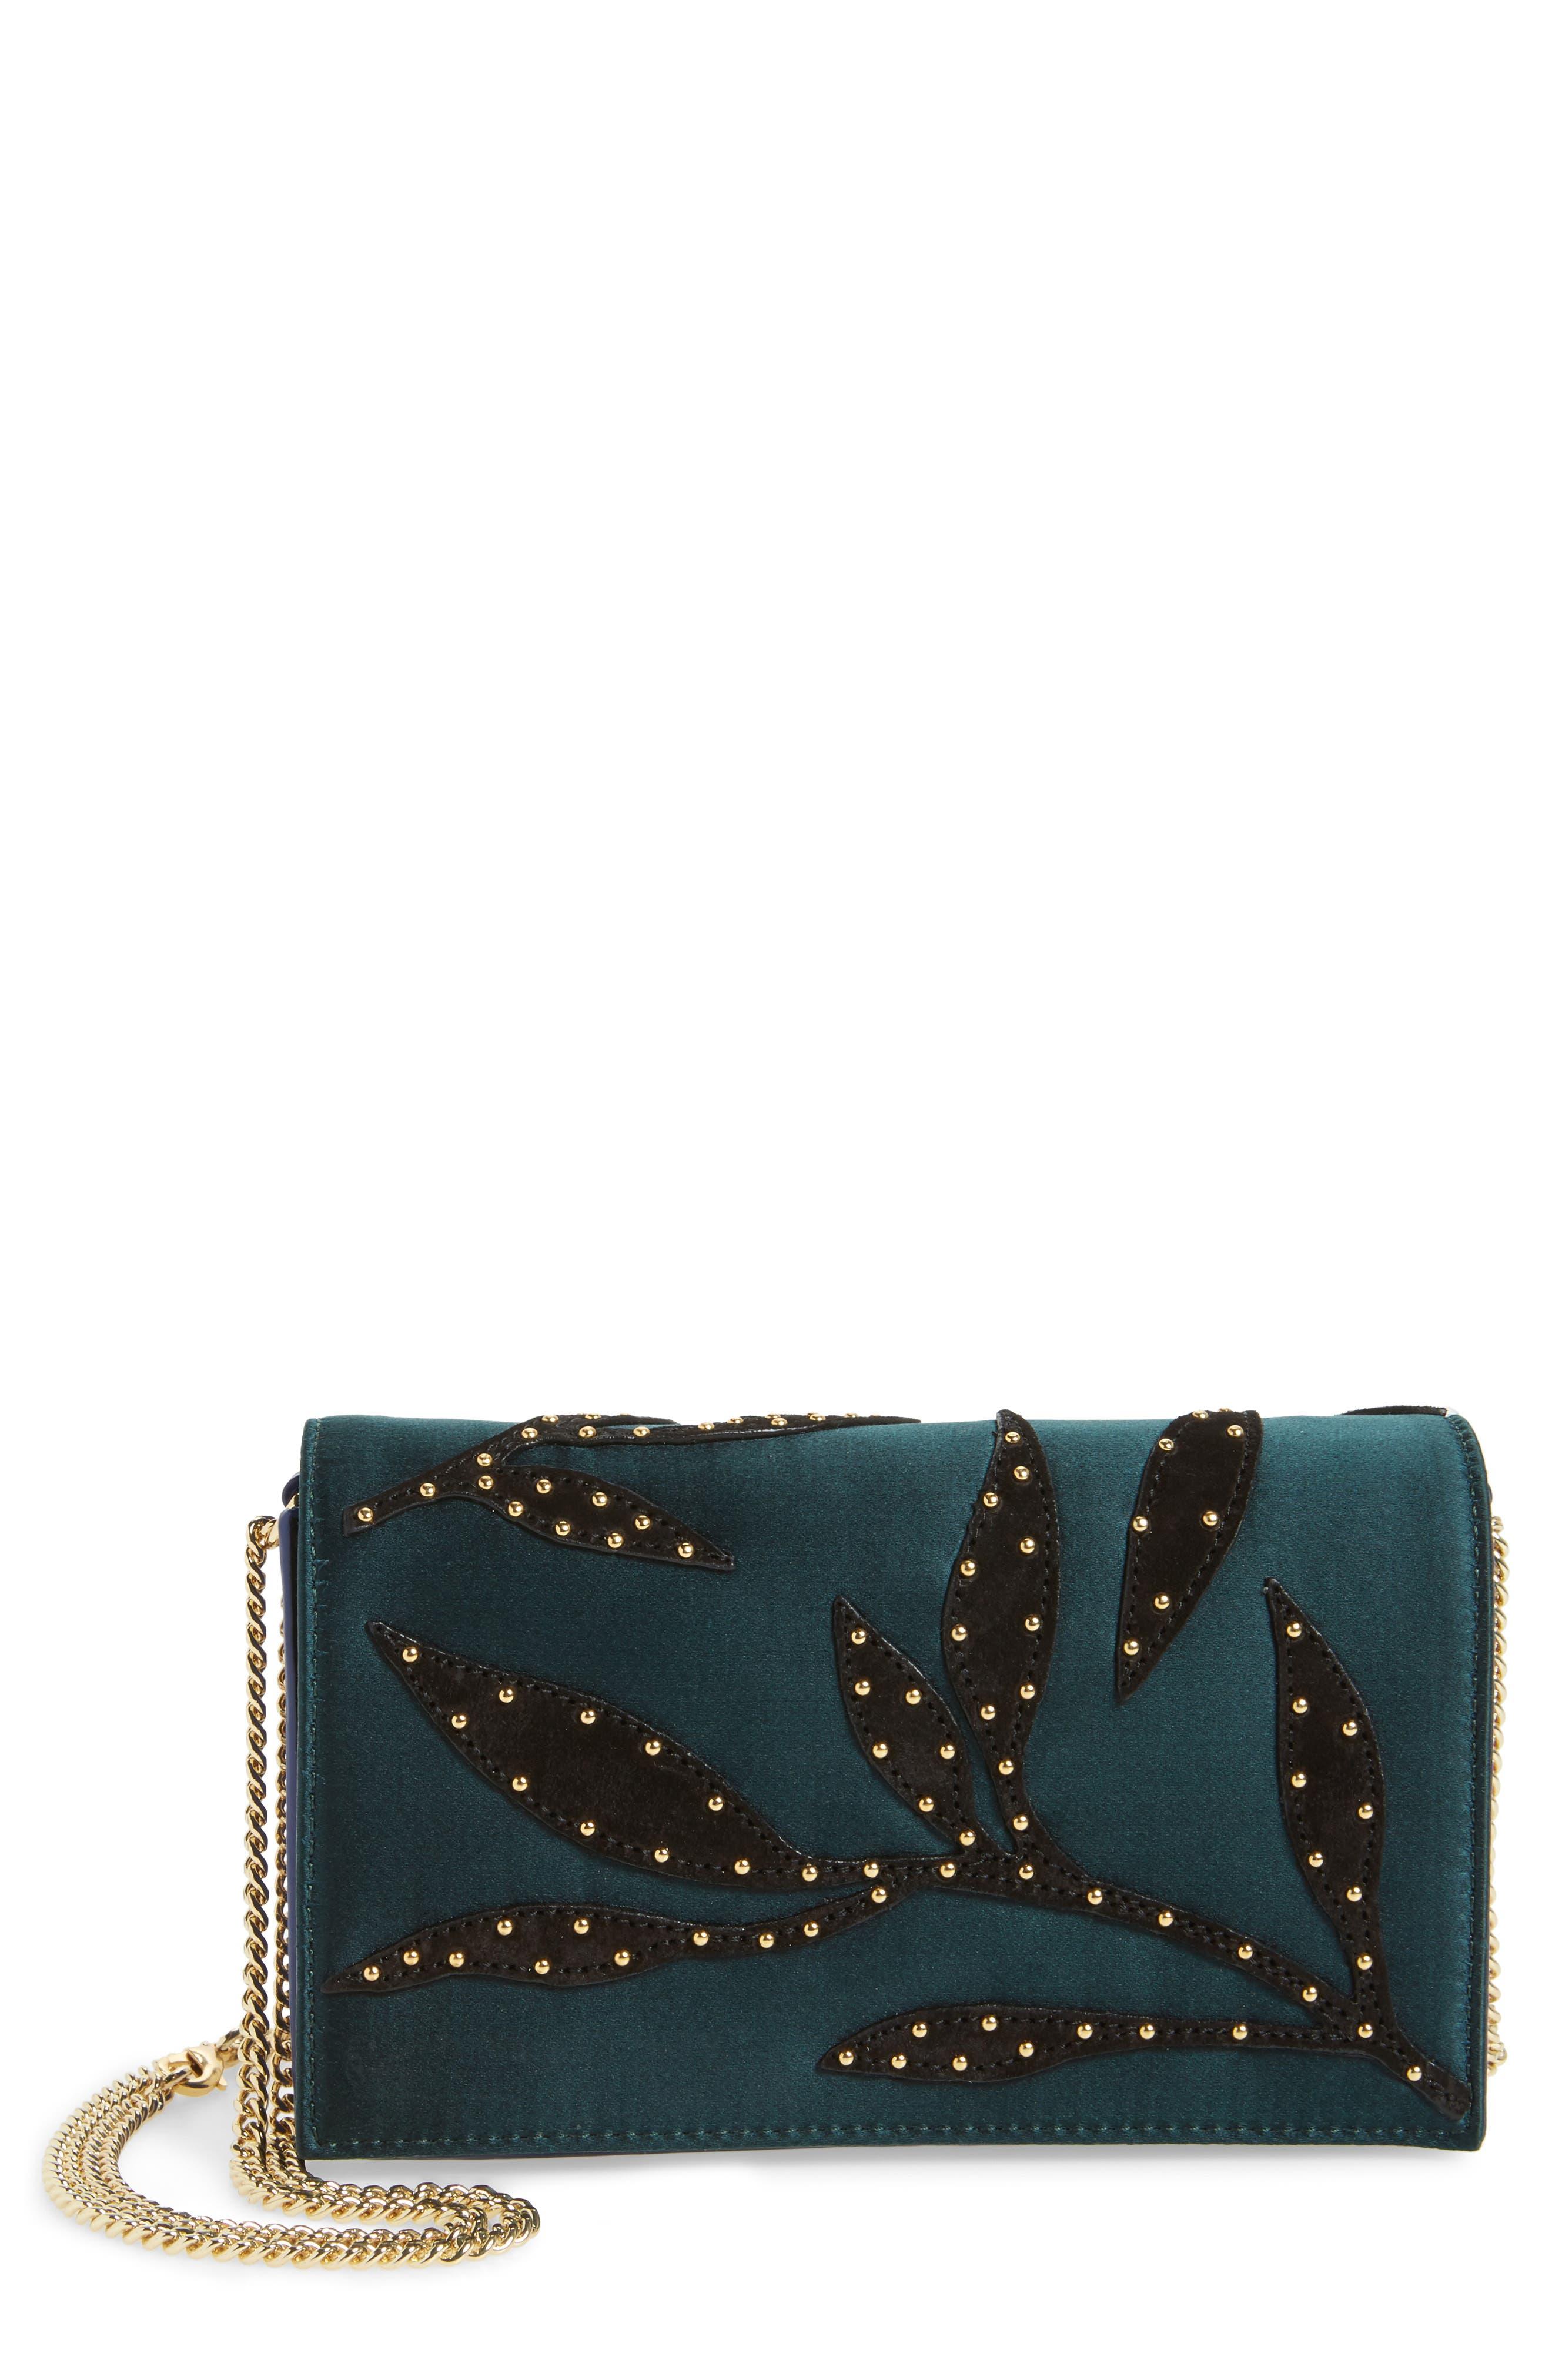 Alternate Image 1 Selected - Diane von Furstenberg Soirée Convertible Crossbody Bag